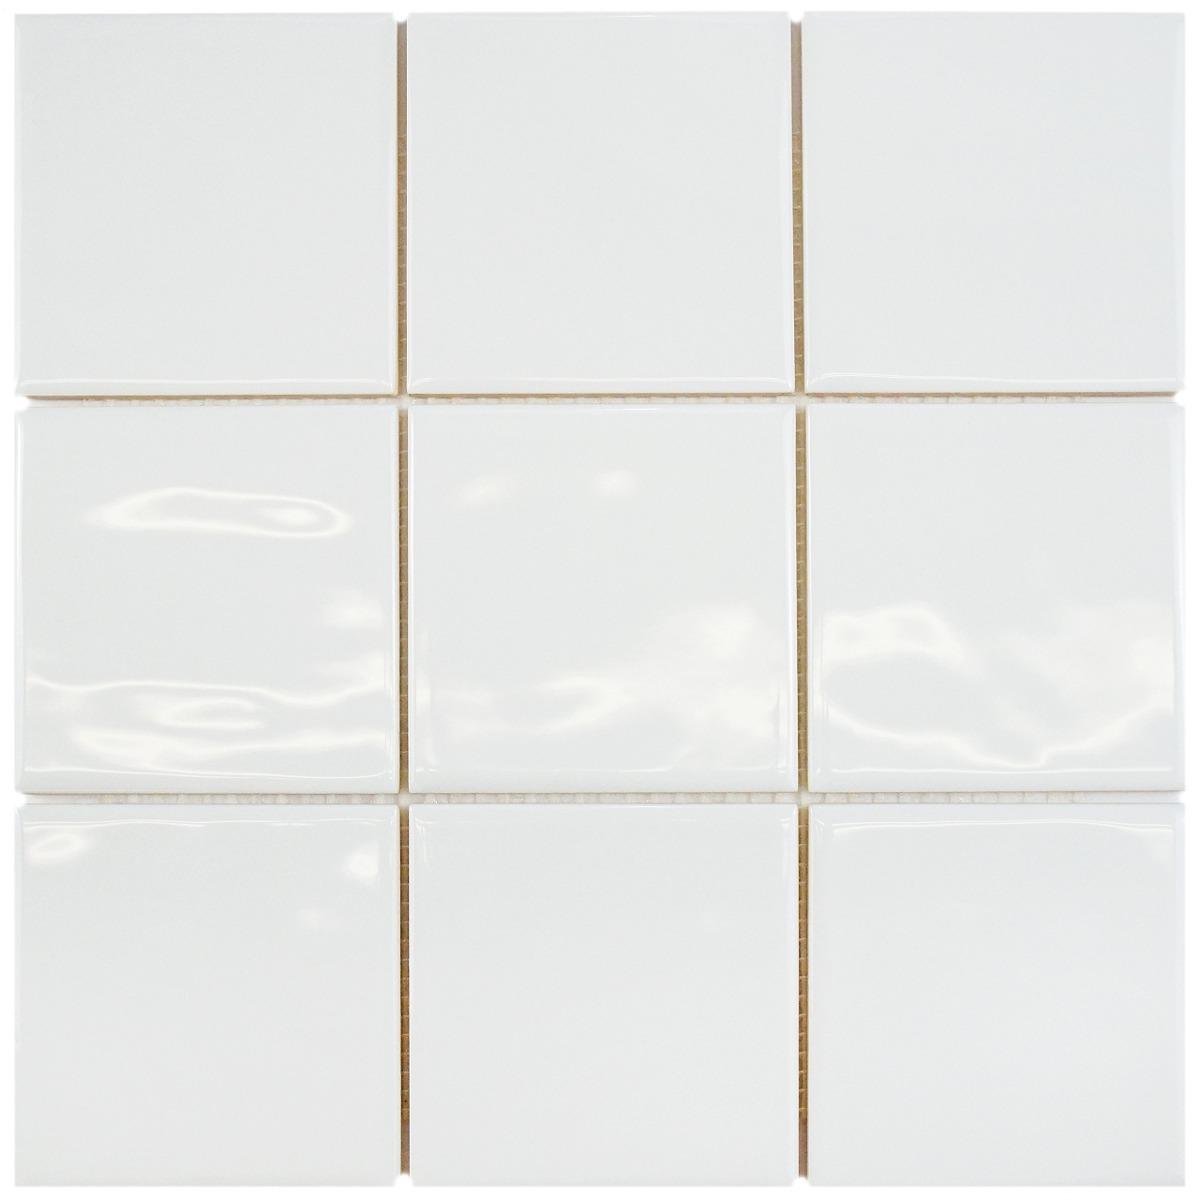 Somertile Wrc4twwi Torsio Square Ceramic Wall Tile 37